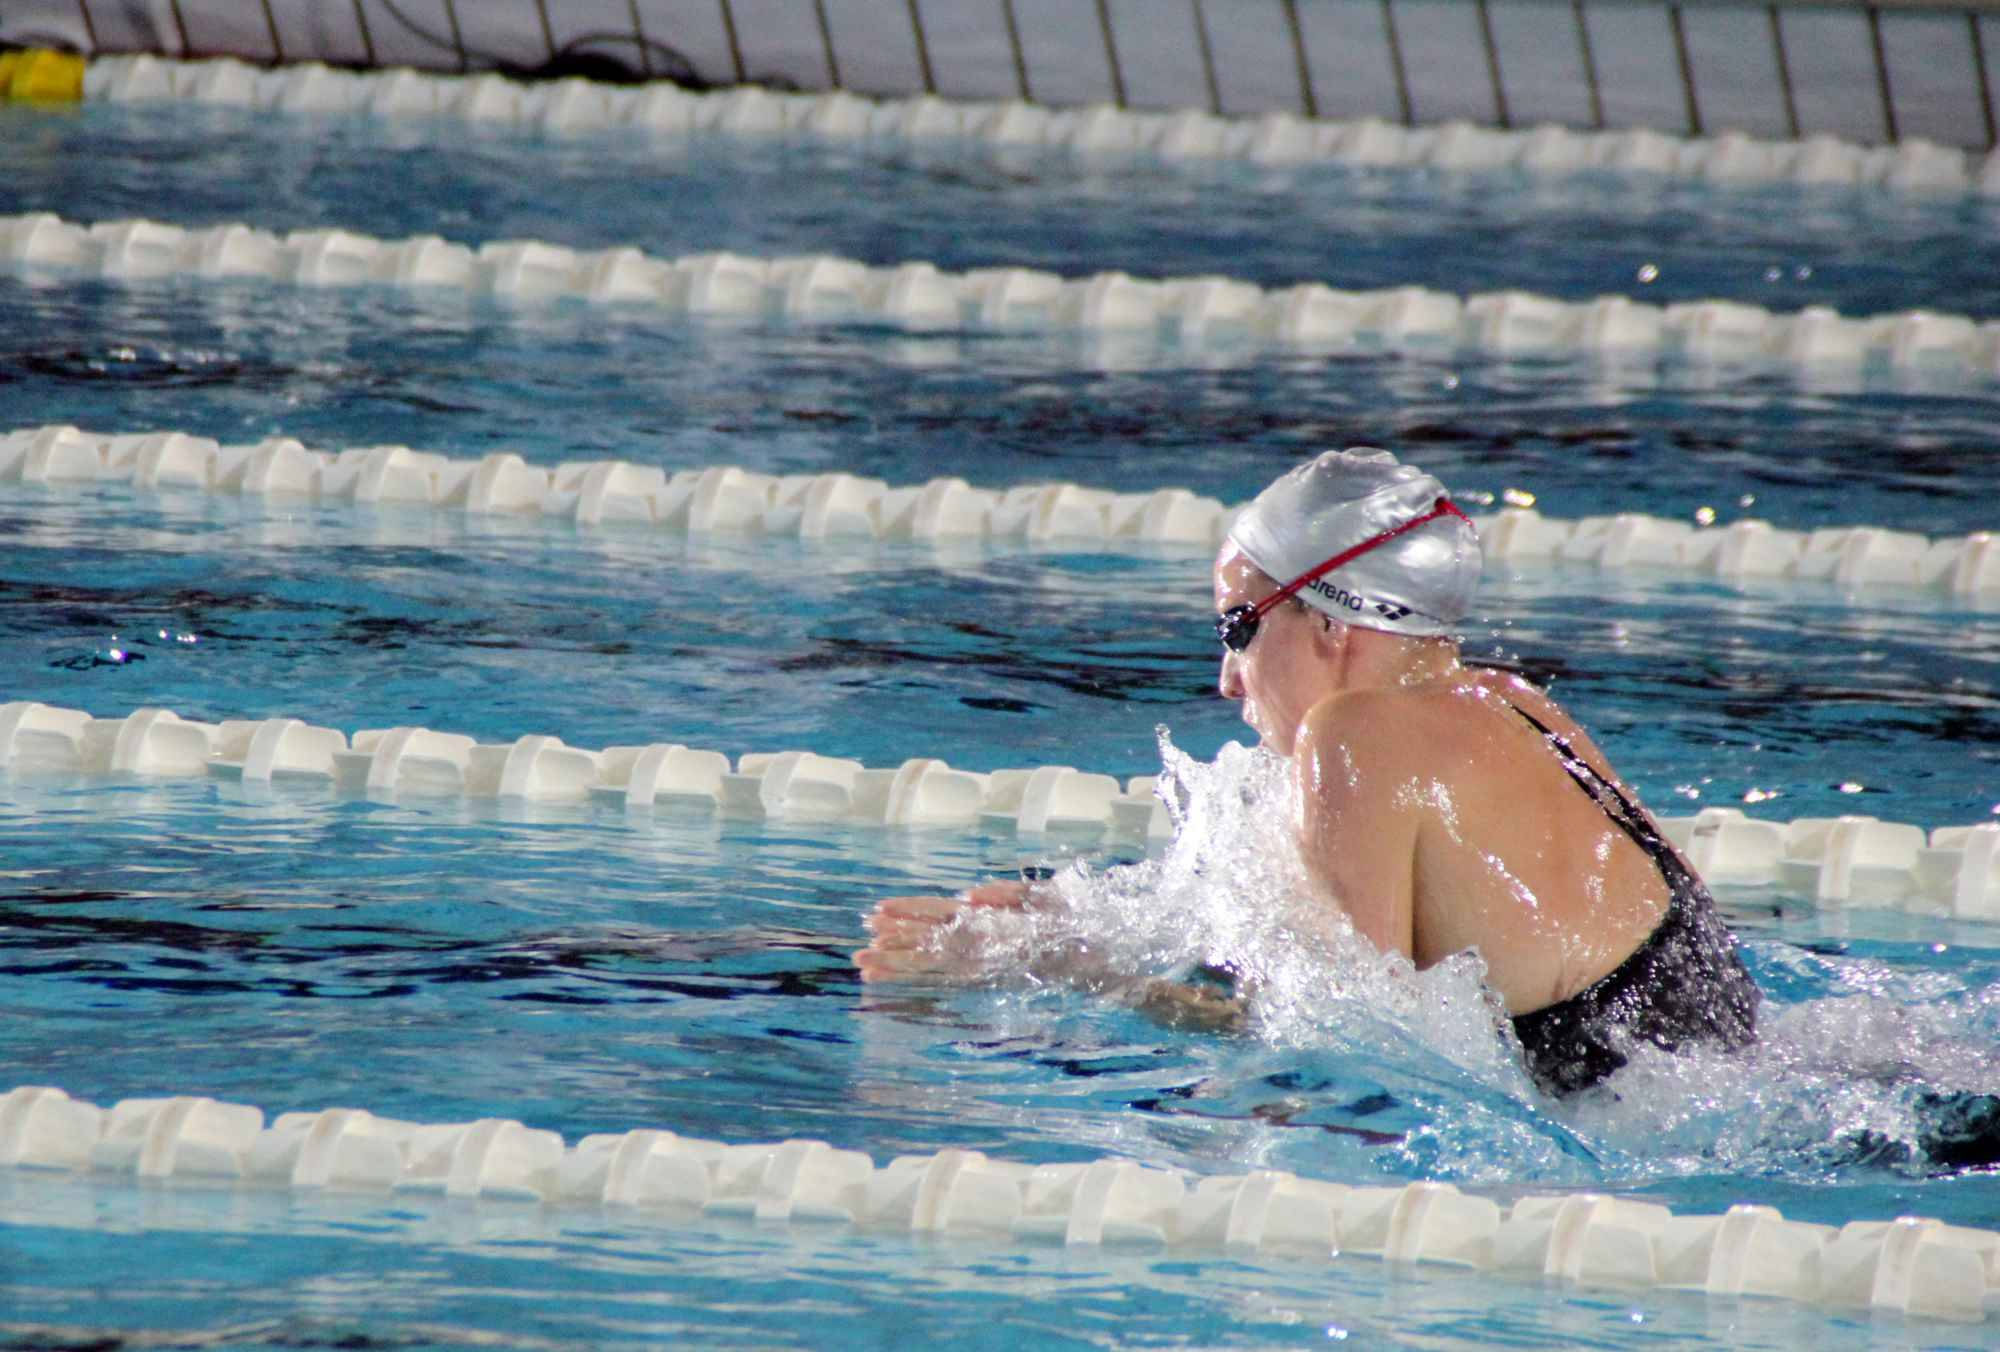 Rennes la piscine de br quigny aura son bassin ext rieur for Brequigny piscine